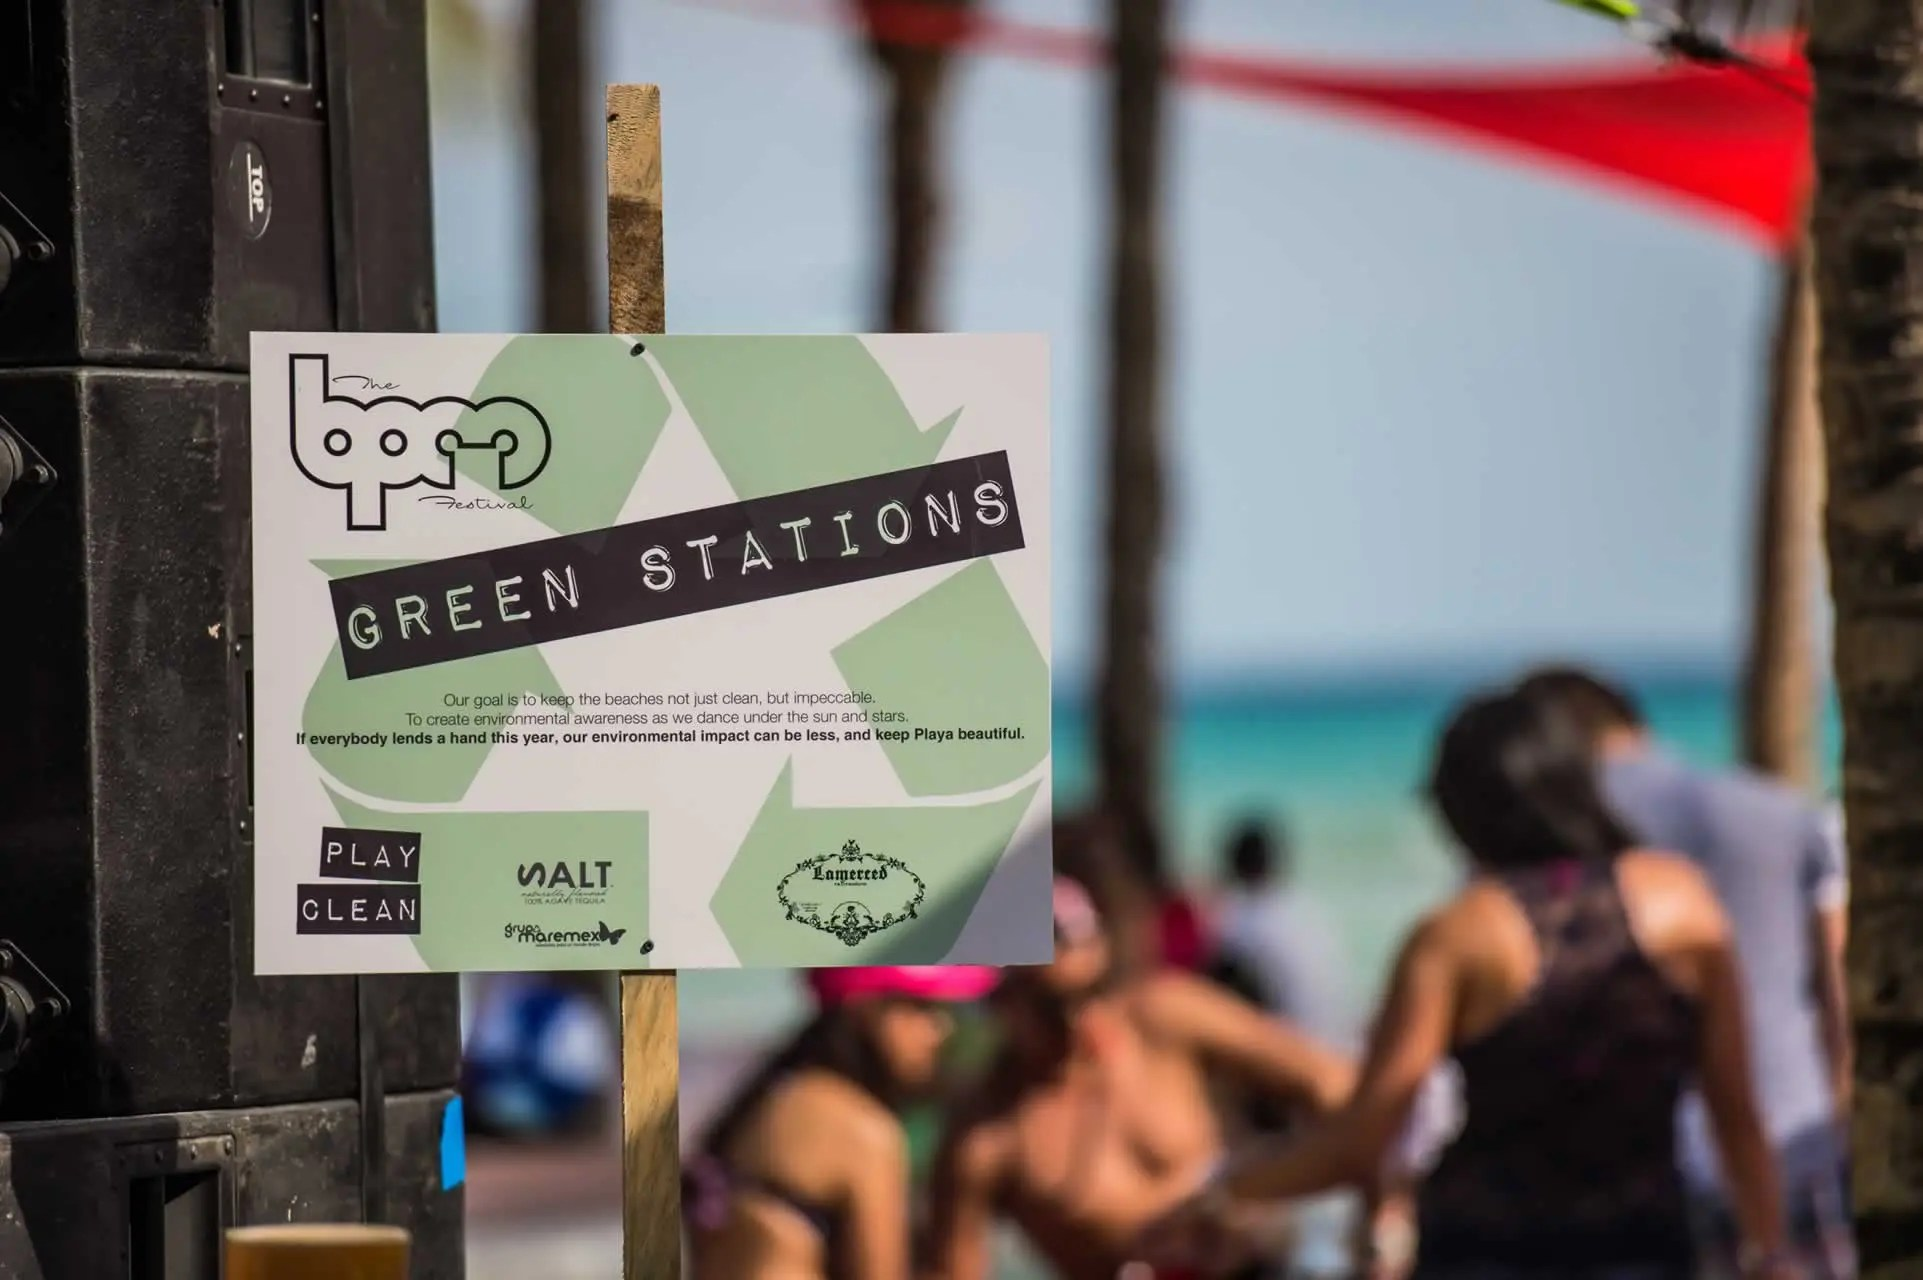 BPM green stations